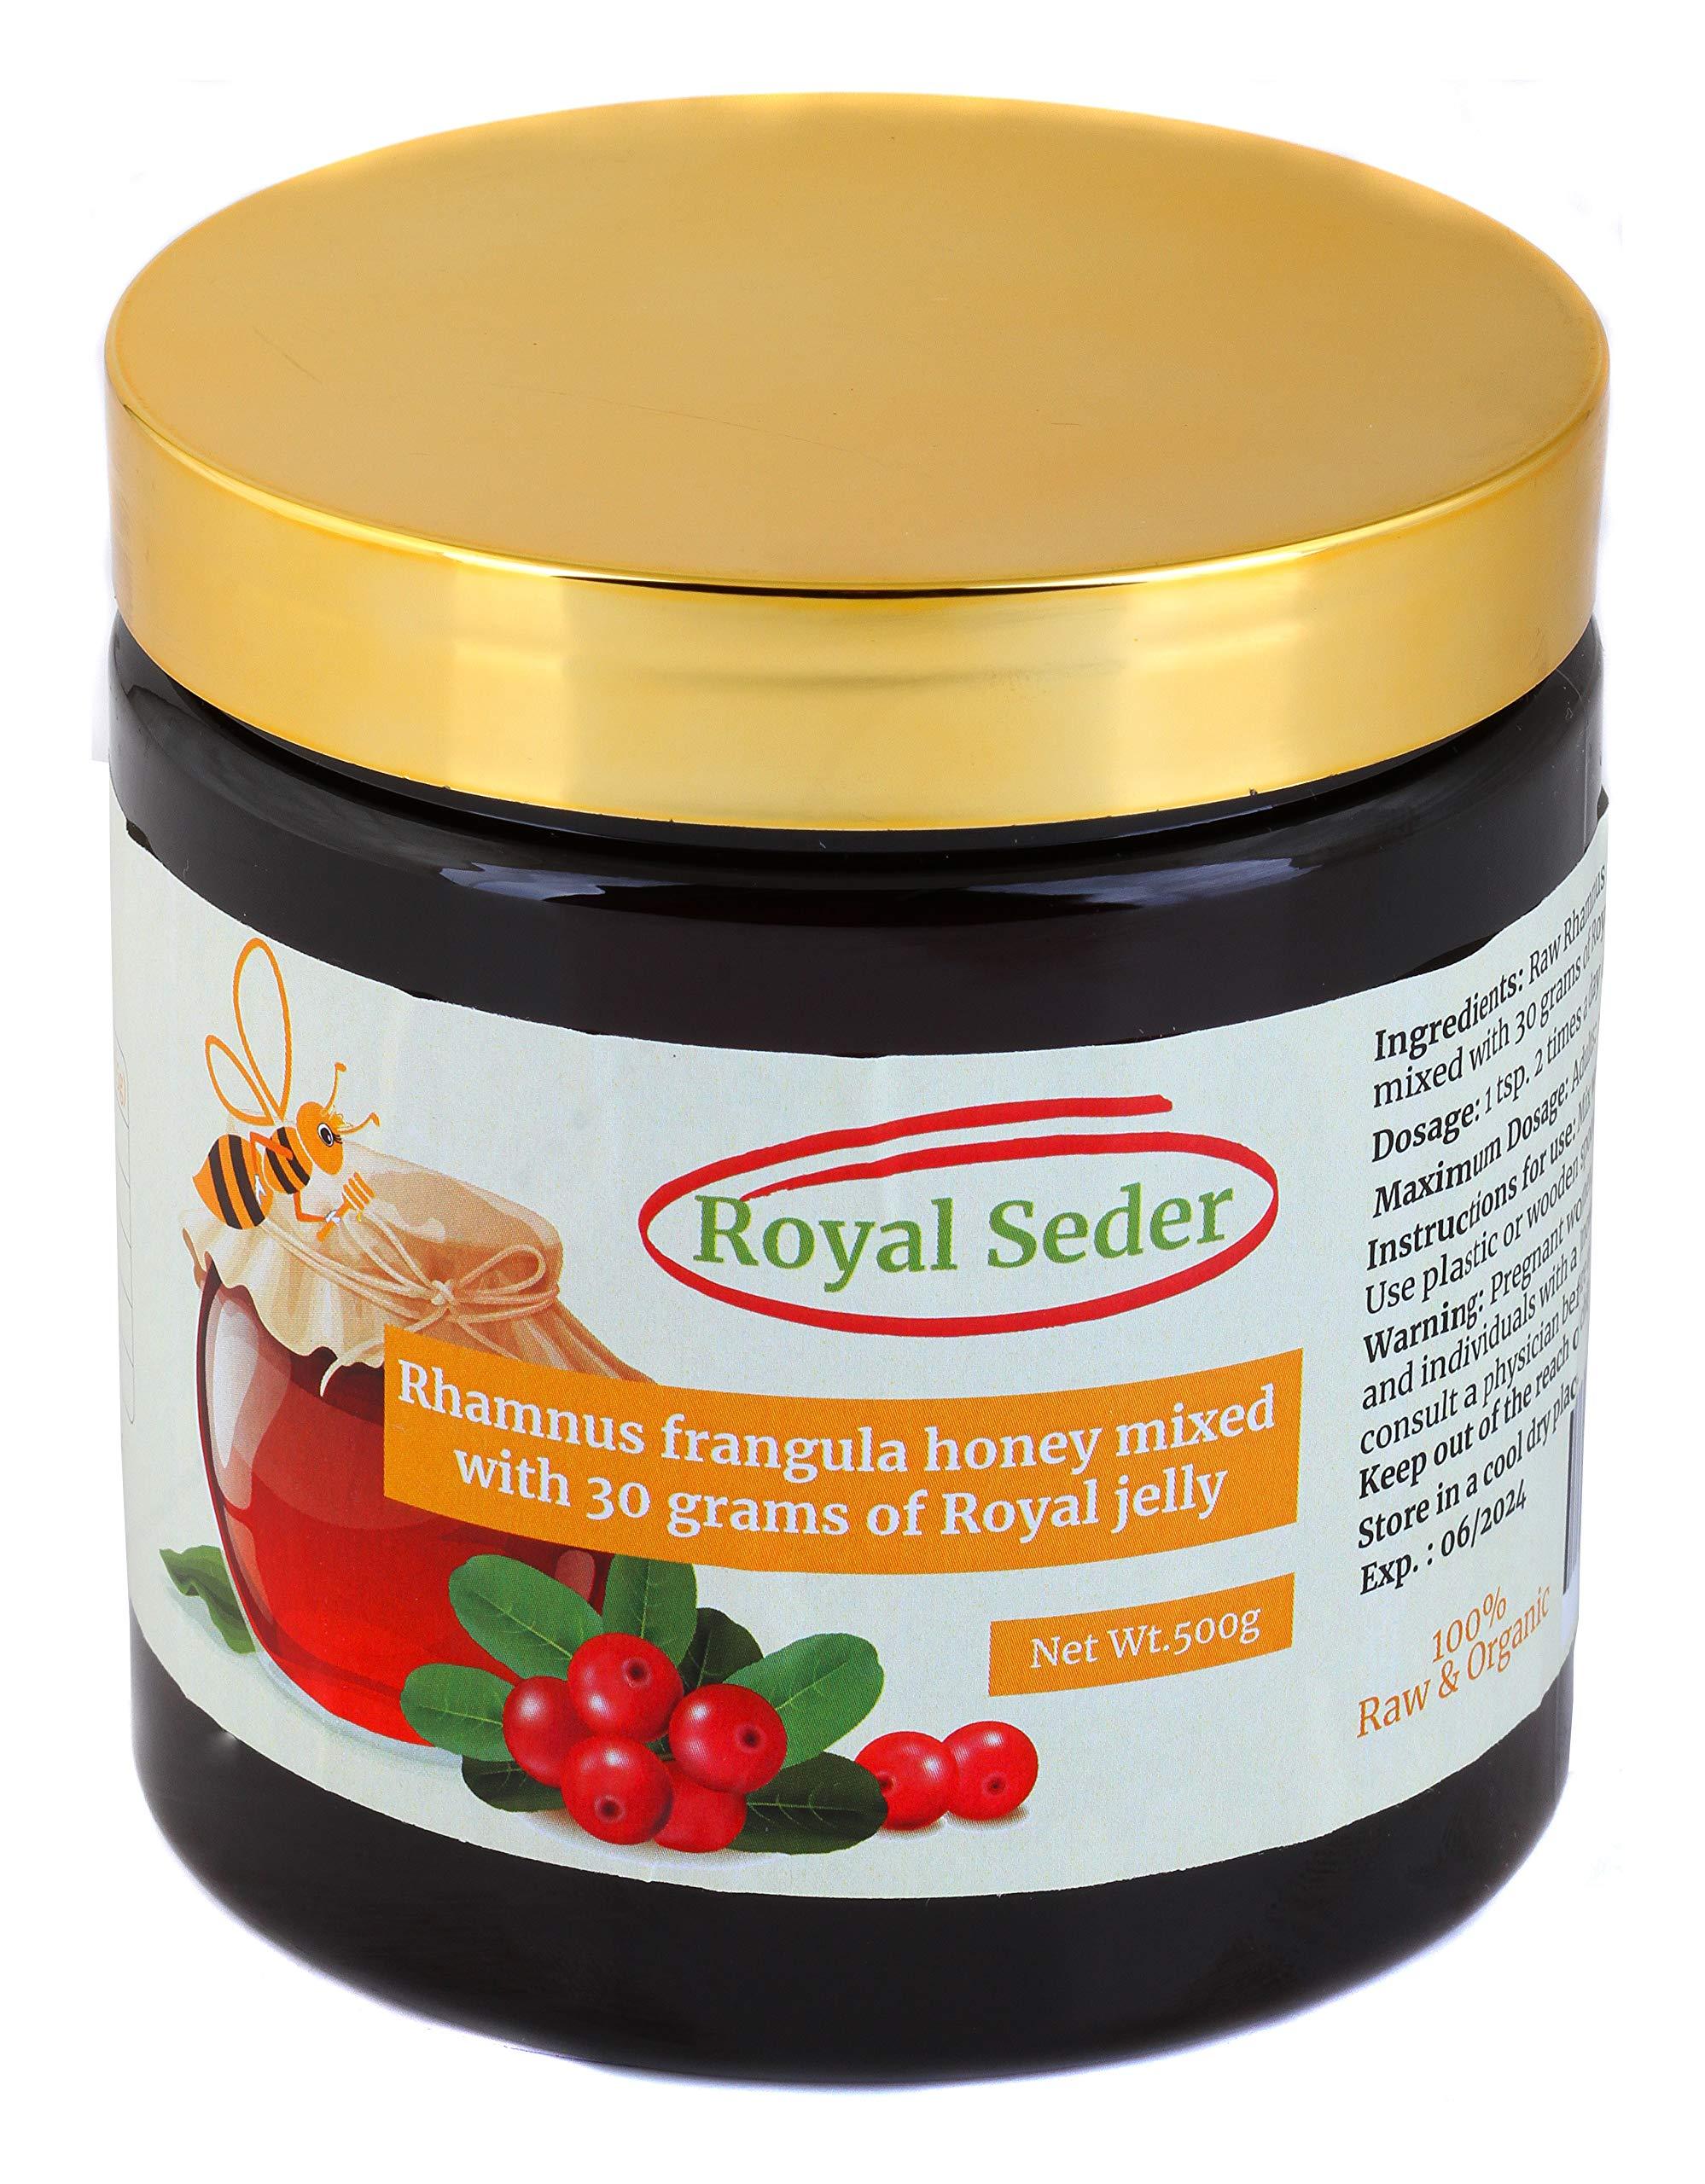 Hekma Center Raw Rhamnus Frangula- Buckthorn Honey Mixed with 30 Grams of Royal Jelly